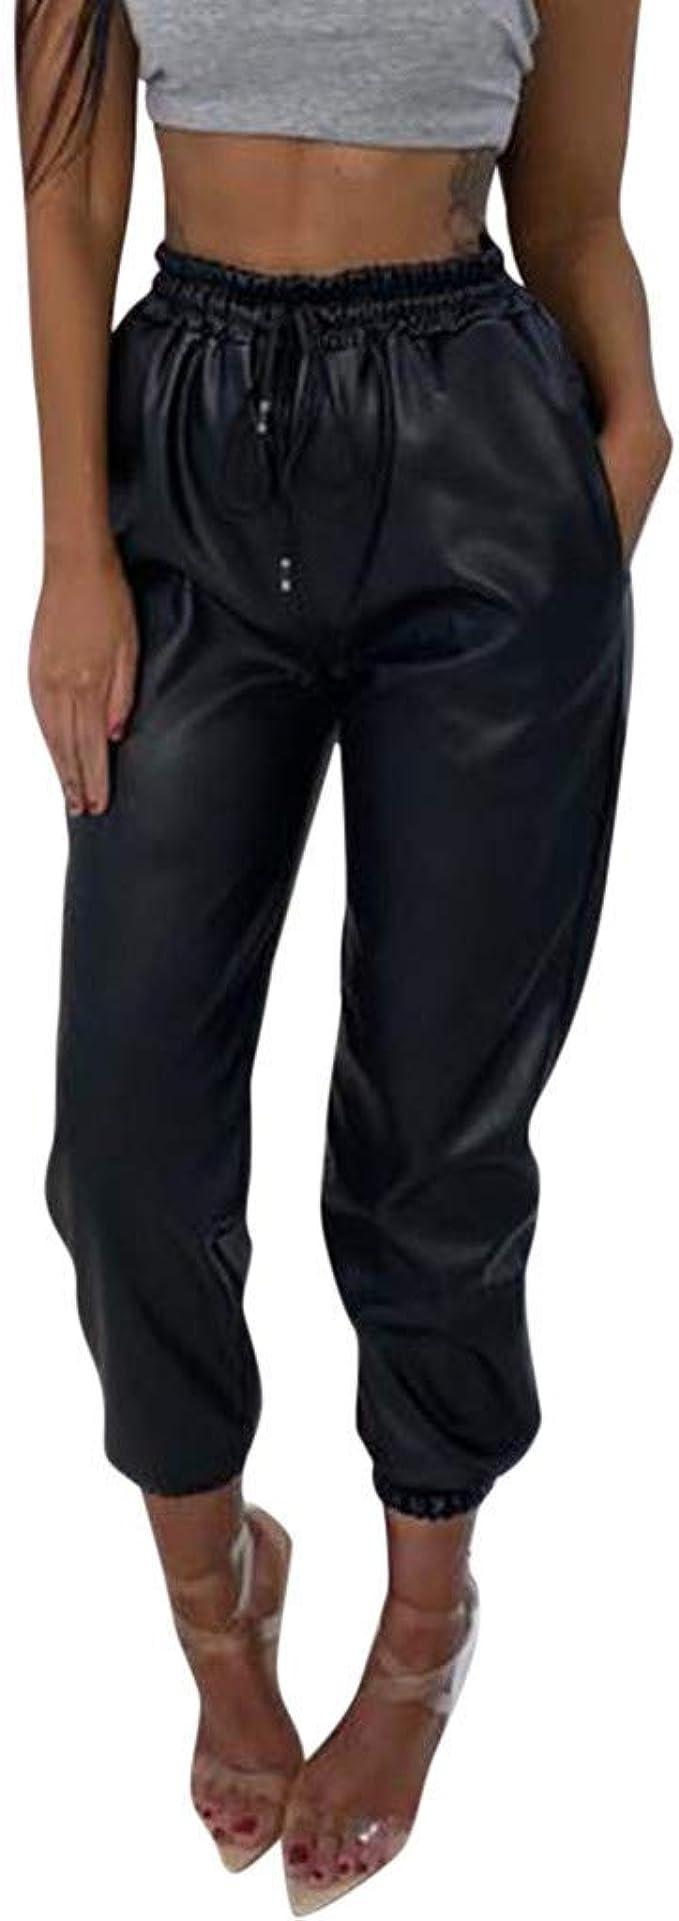 Da Donna Donna in Finta pelle Vita Alta Pantaloni Sportivi Jogging Bottoms pants pantaloni